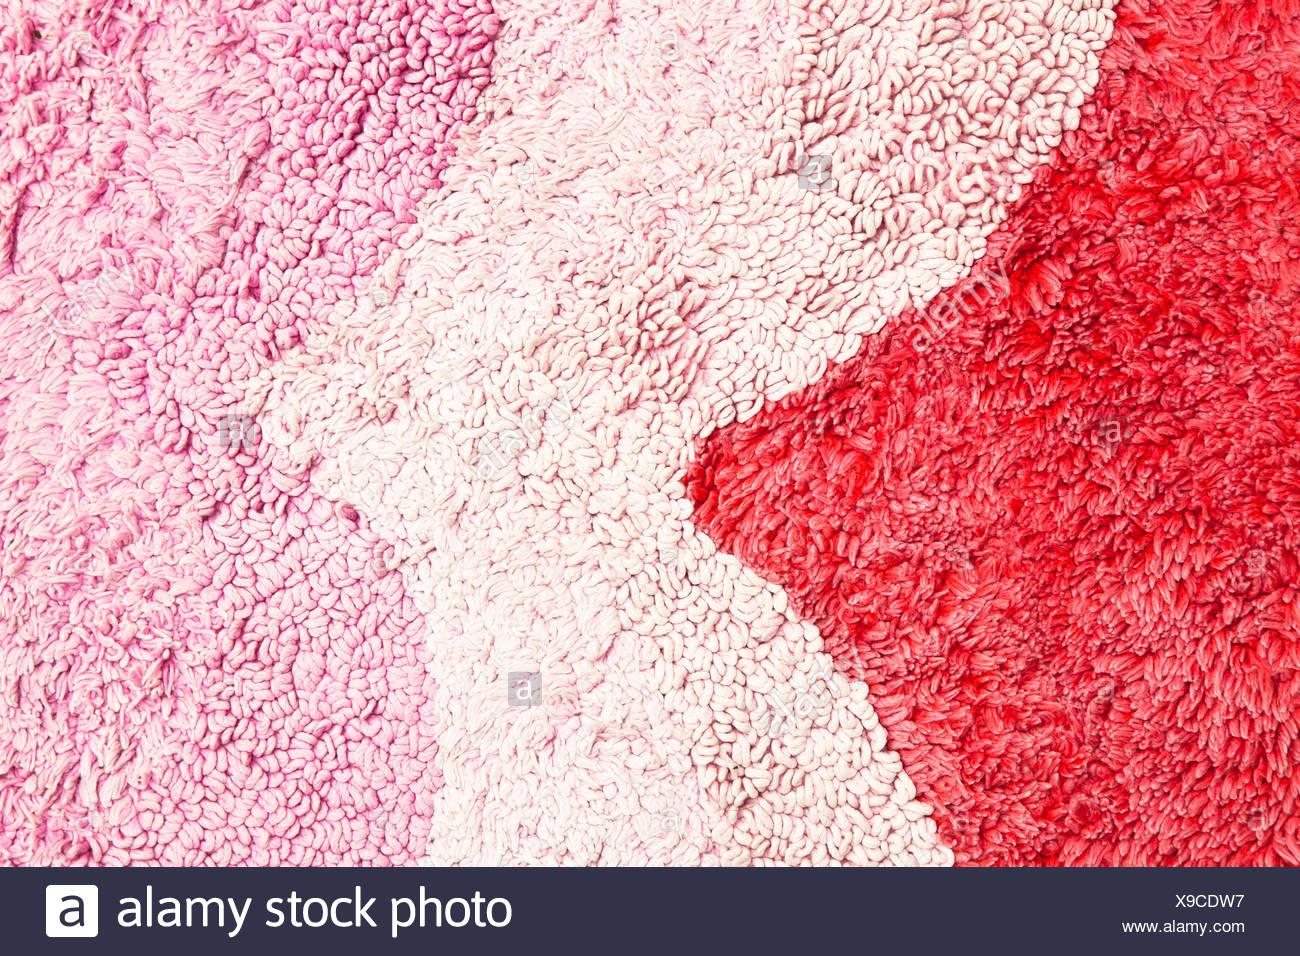 Pink rug - Stock Image